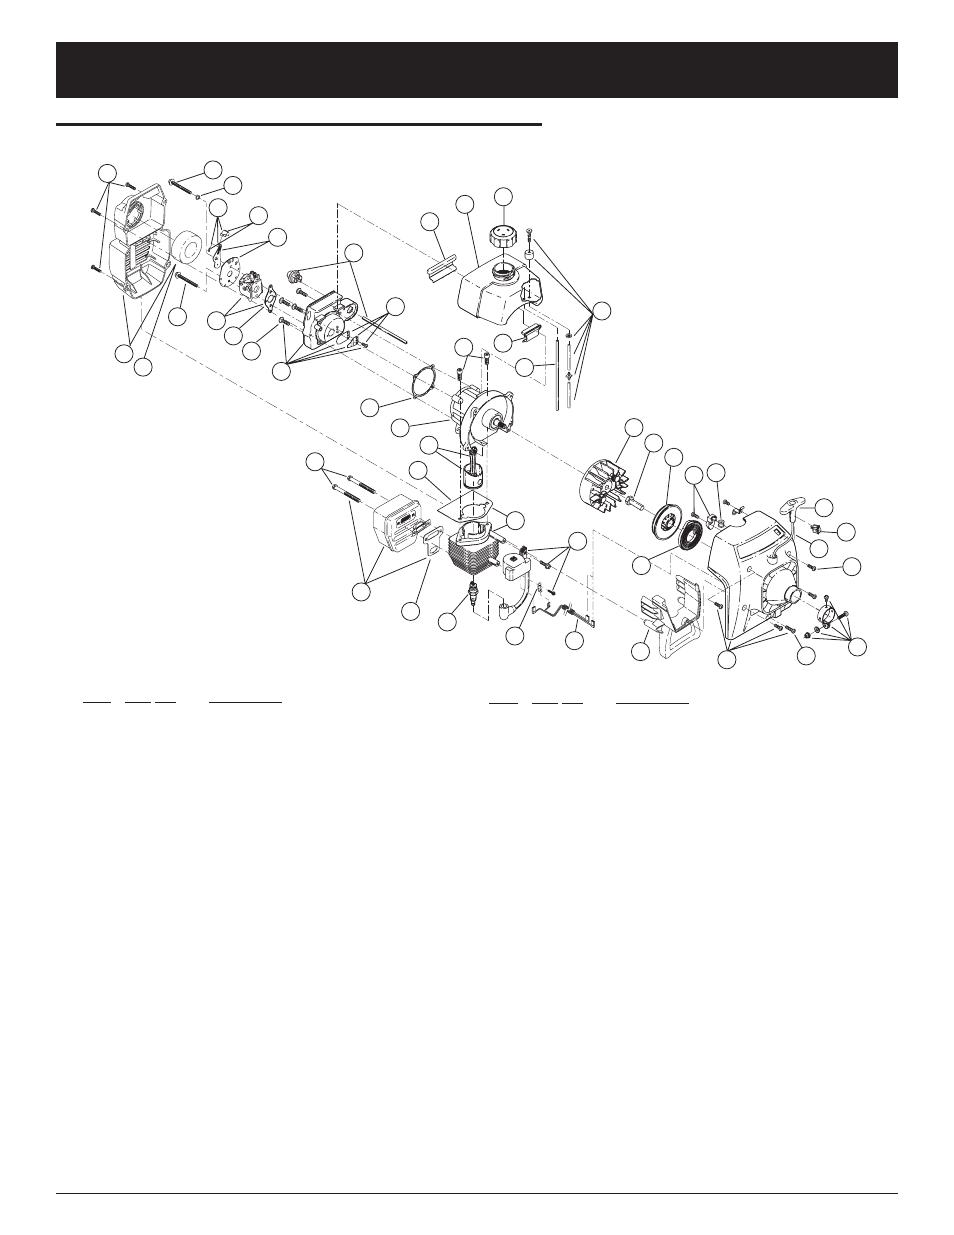 Parts list, engine parts ryobi 700r 2-cycle gas trimmer | ryobi.